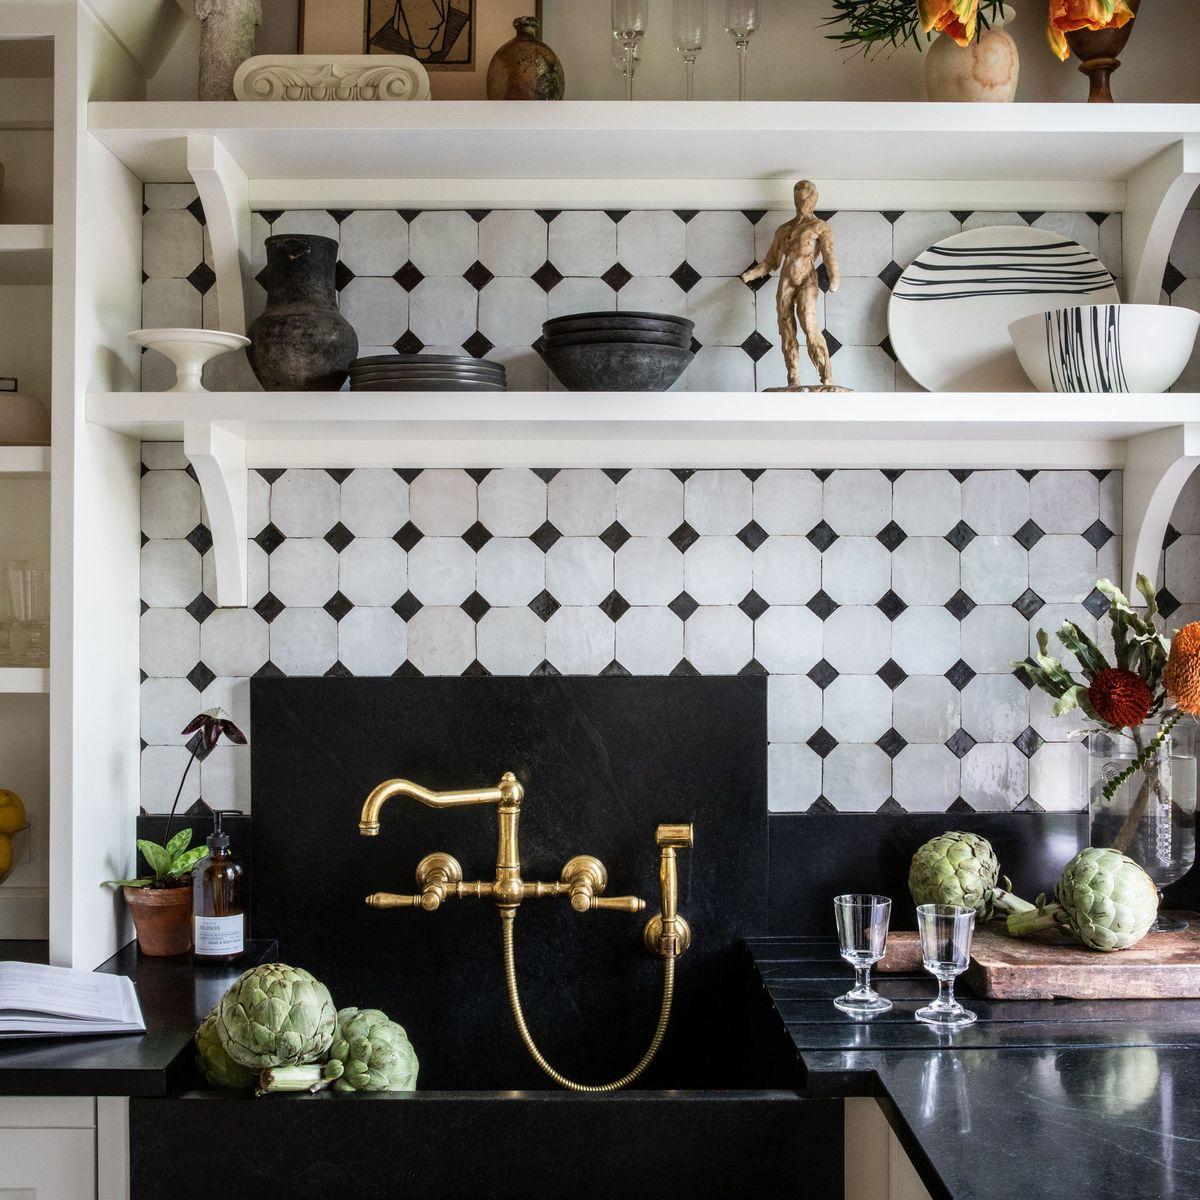 kitchen backsplash ideas wall tiles